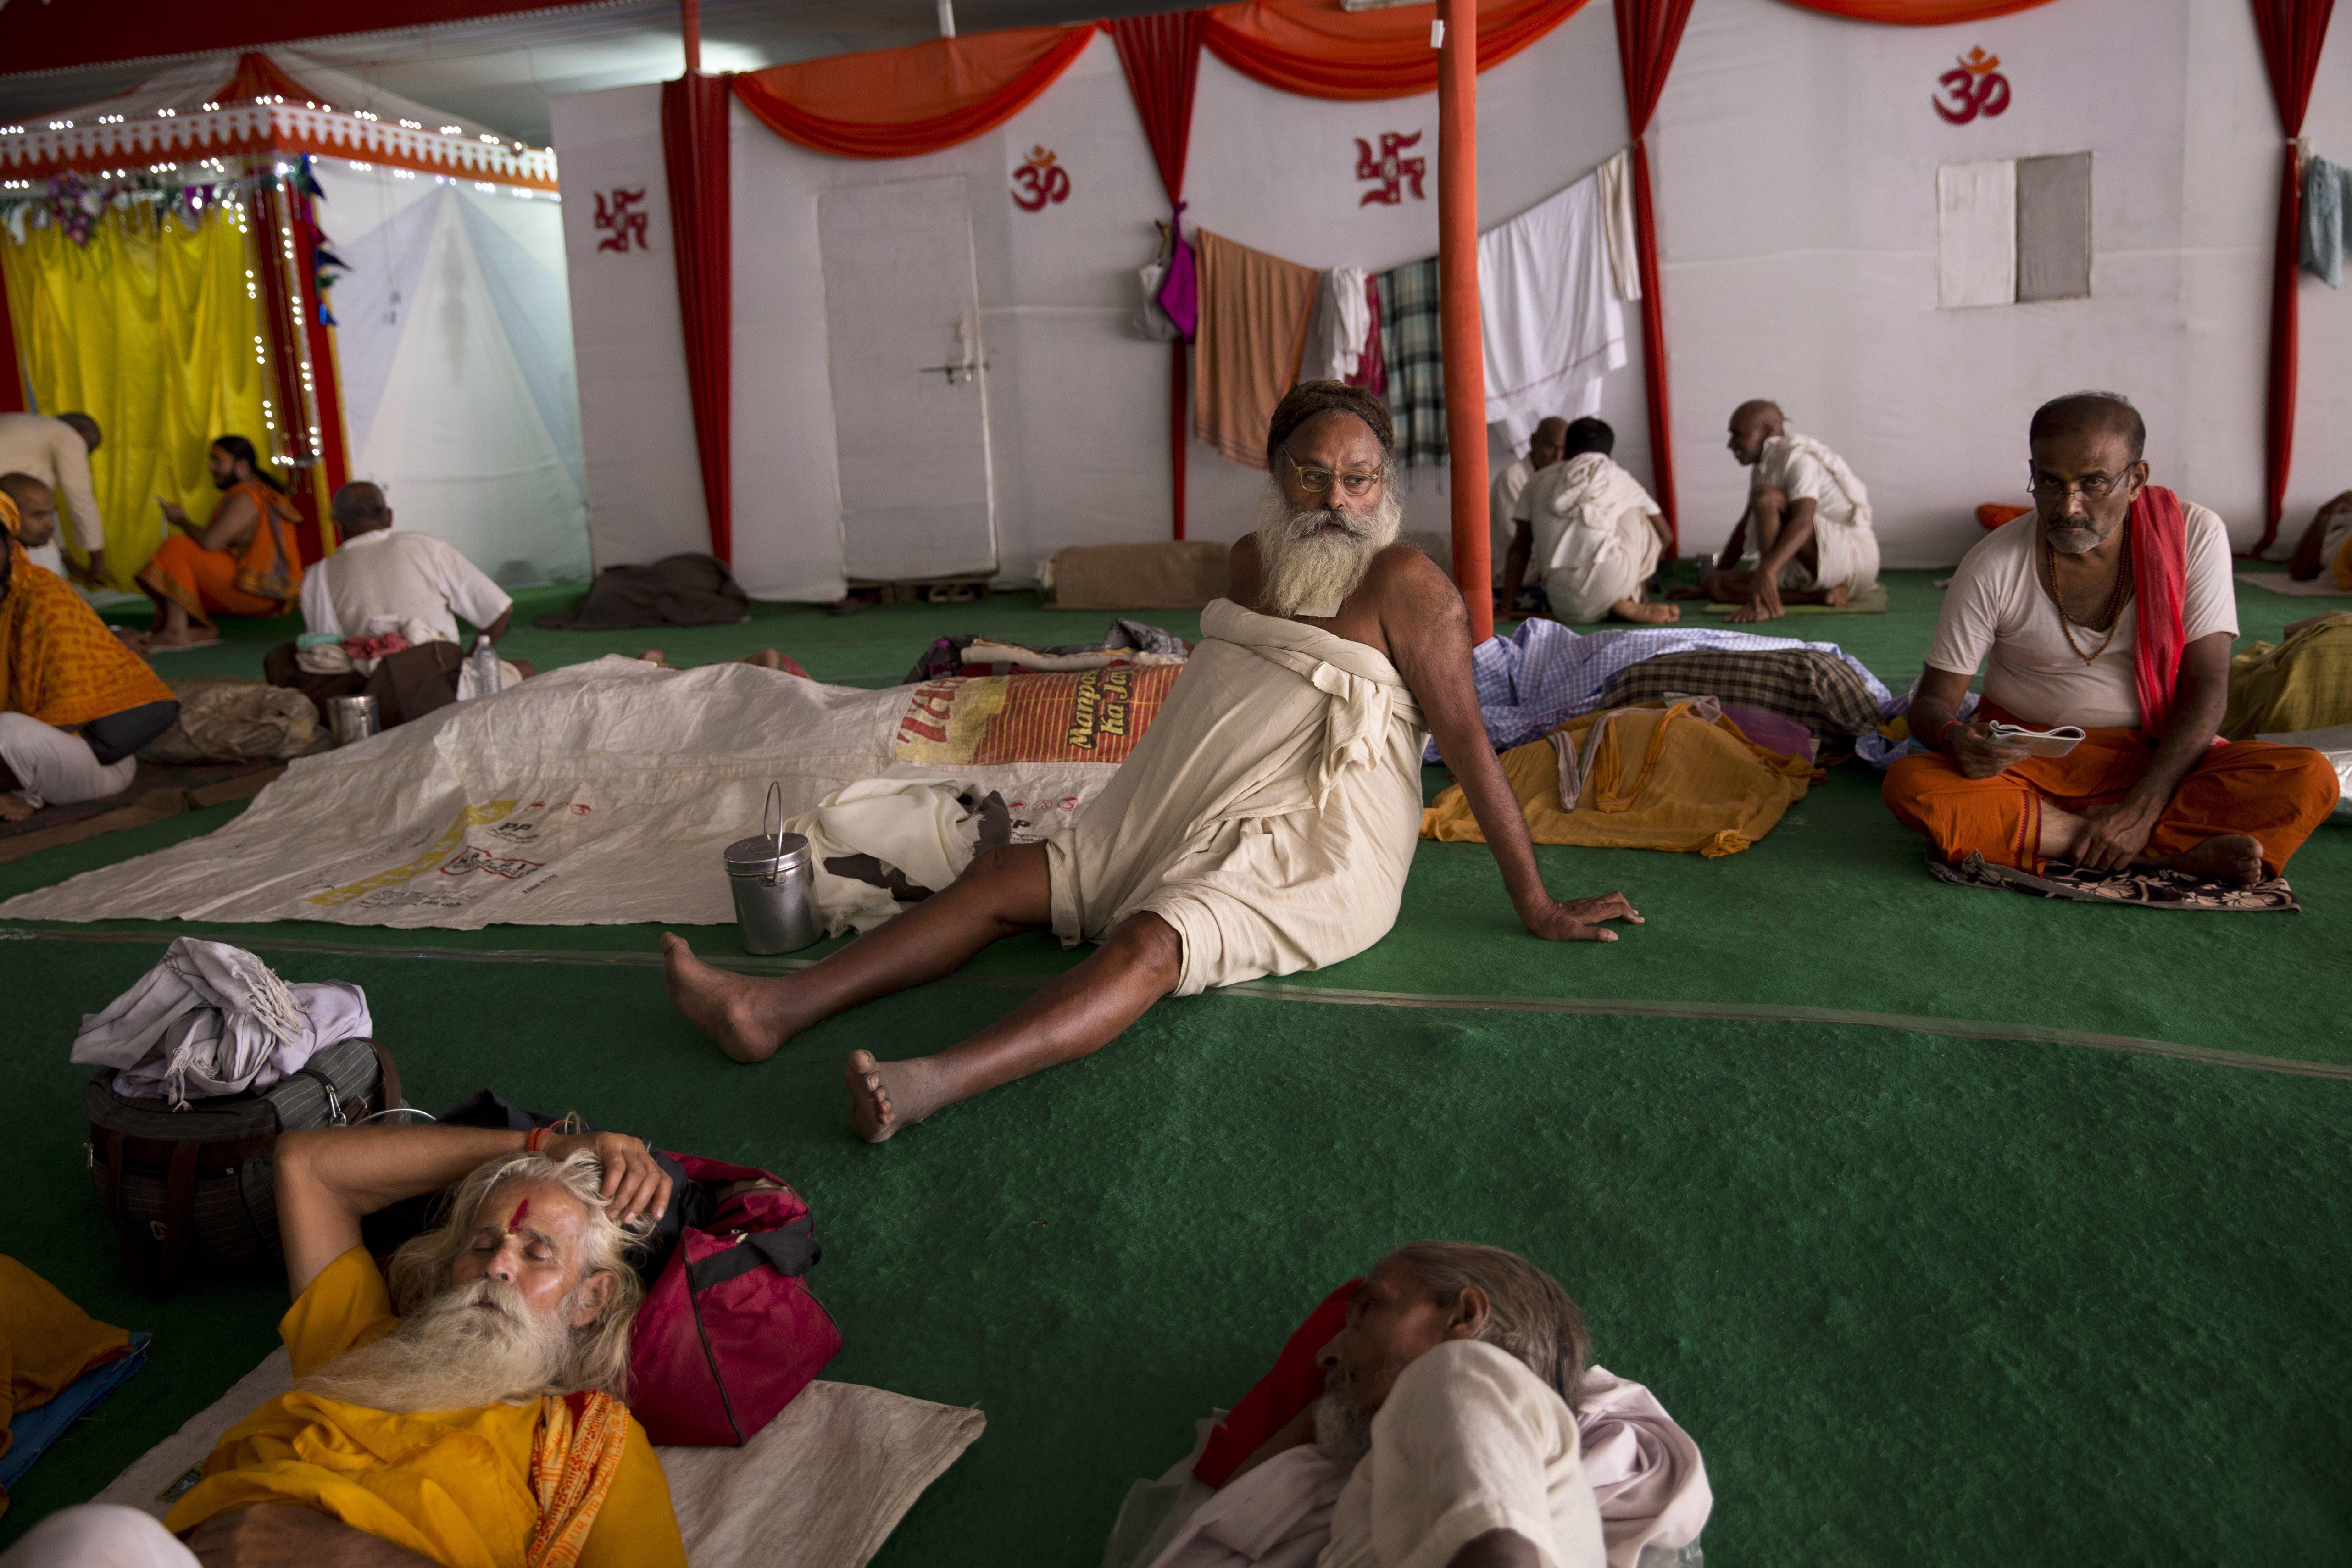 Hindu holy men take rest at a make shift shelter during Kumbh Mela in Nashik, India, on Aug. 27, 2015.